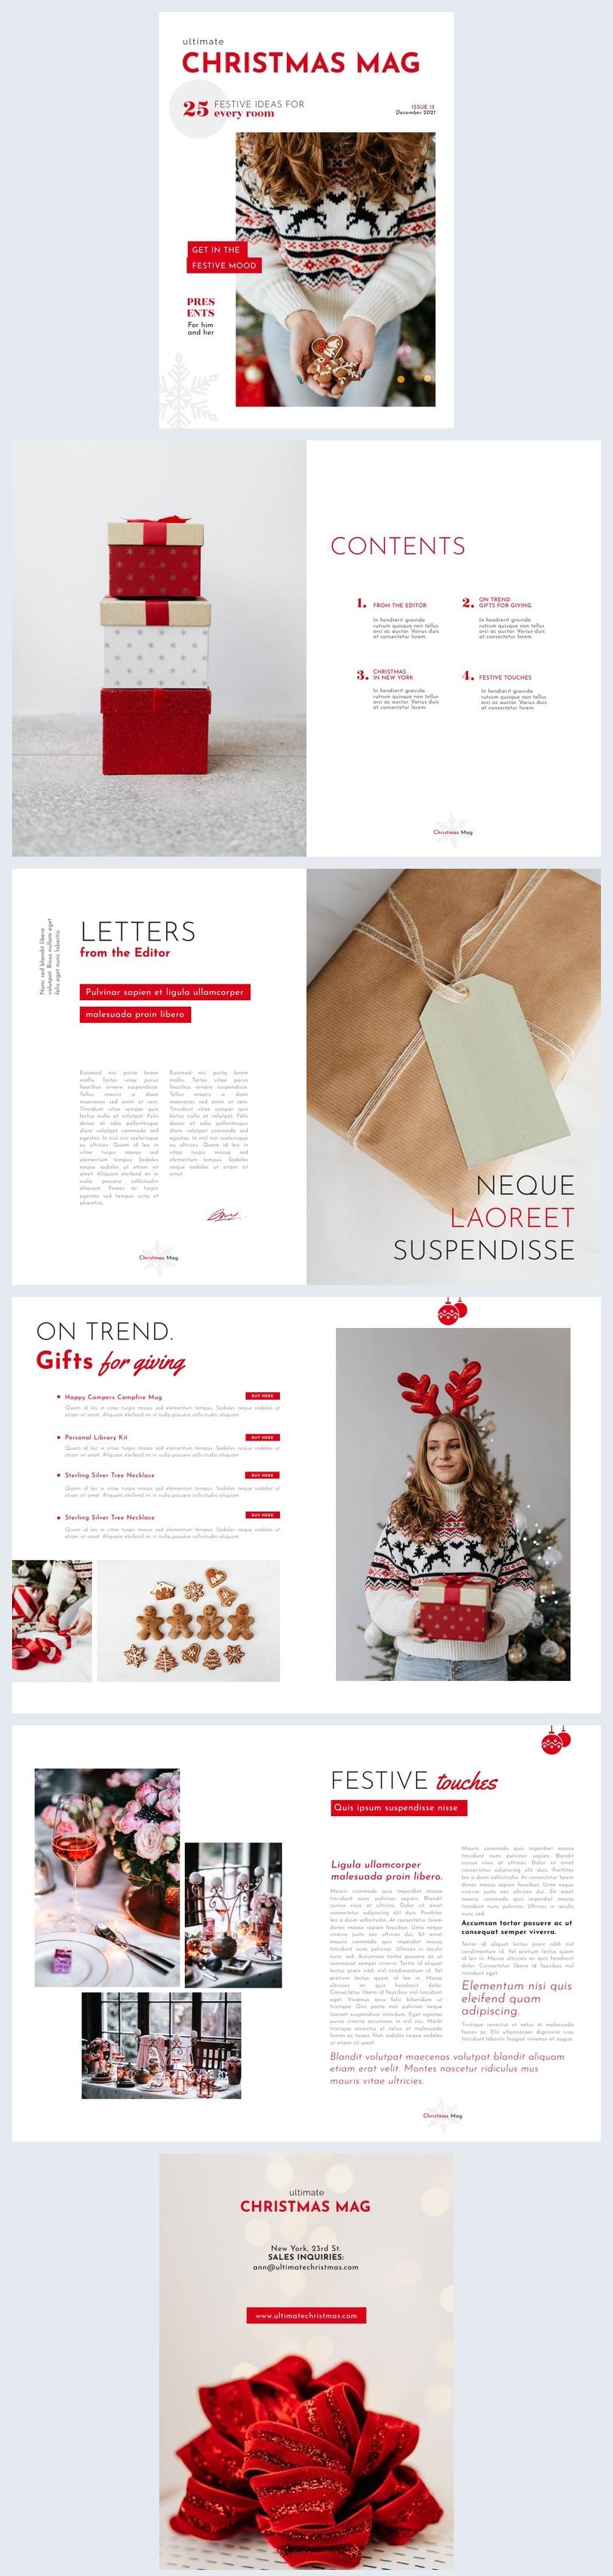 Modern Christmas Magazine Design Example